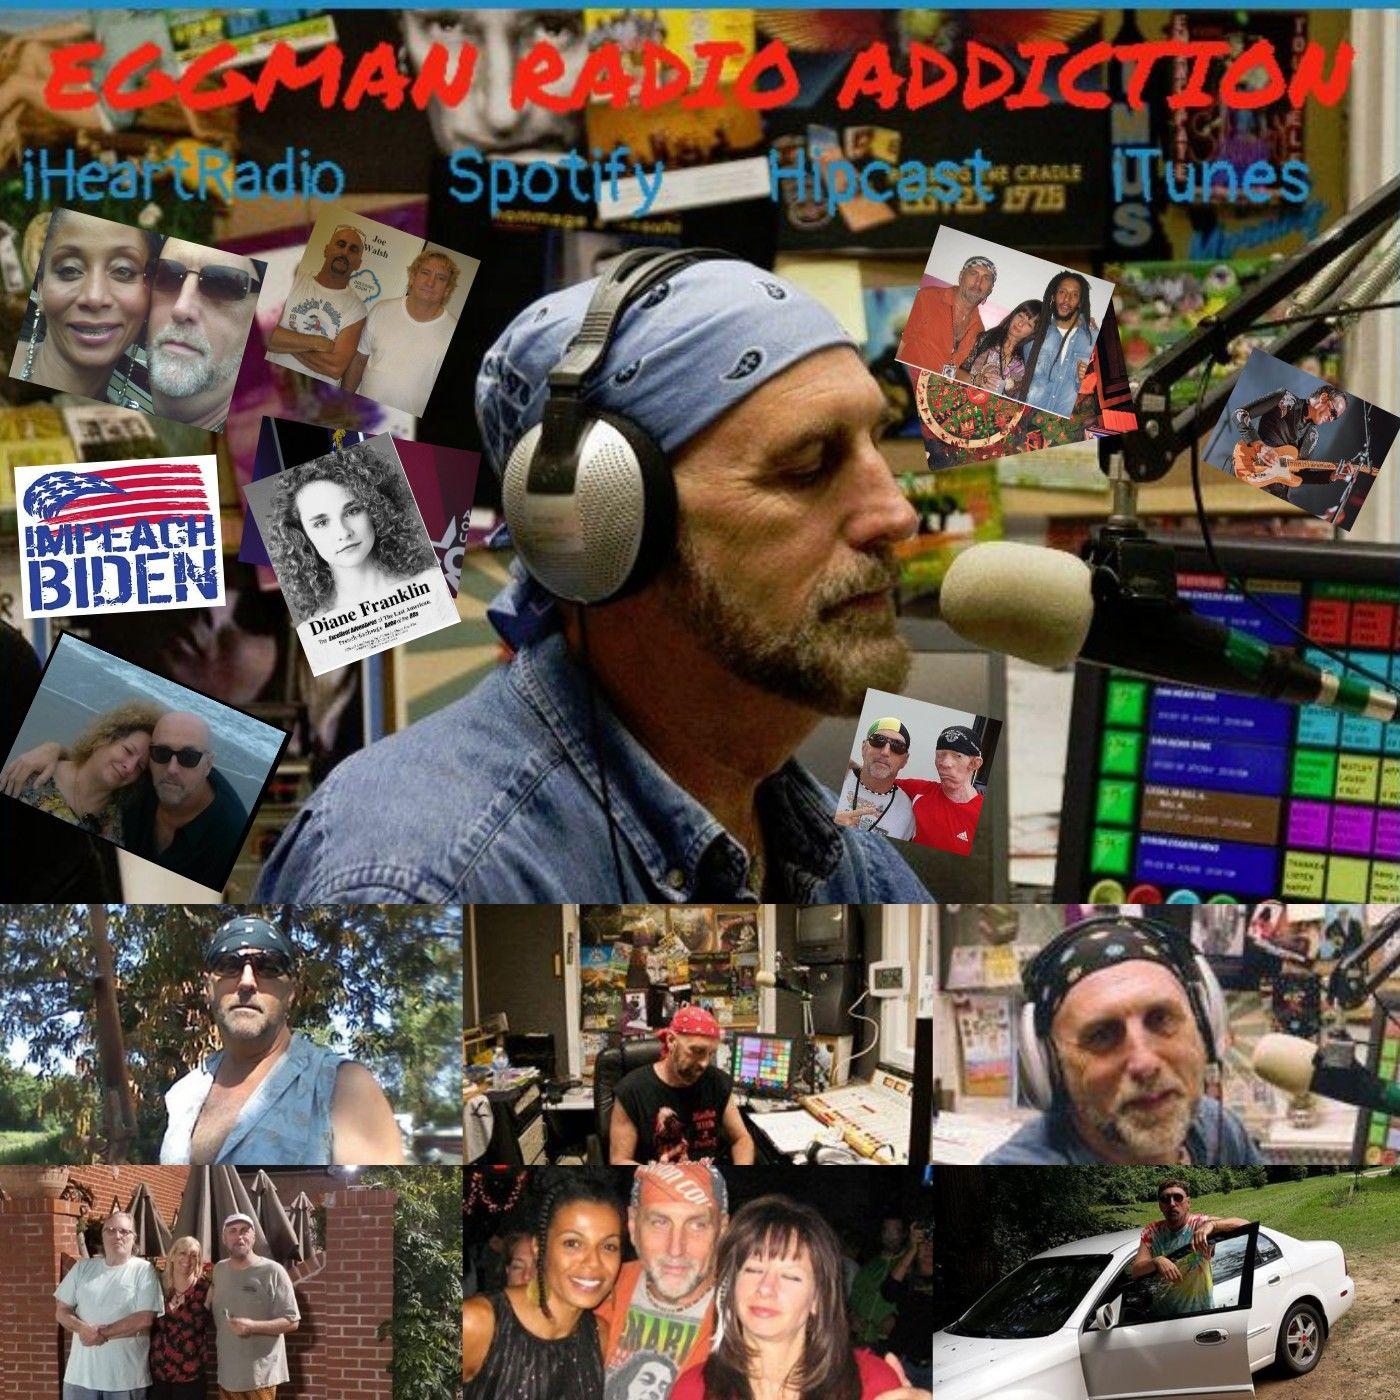 EGGMAN RADIO ADDICITION